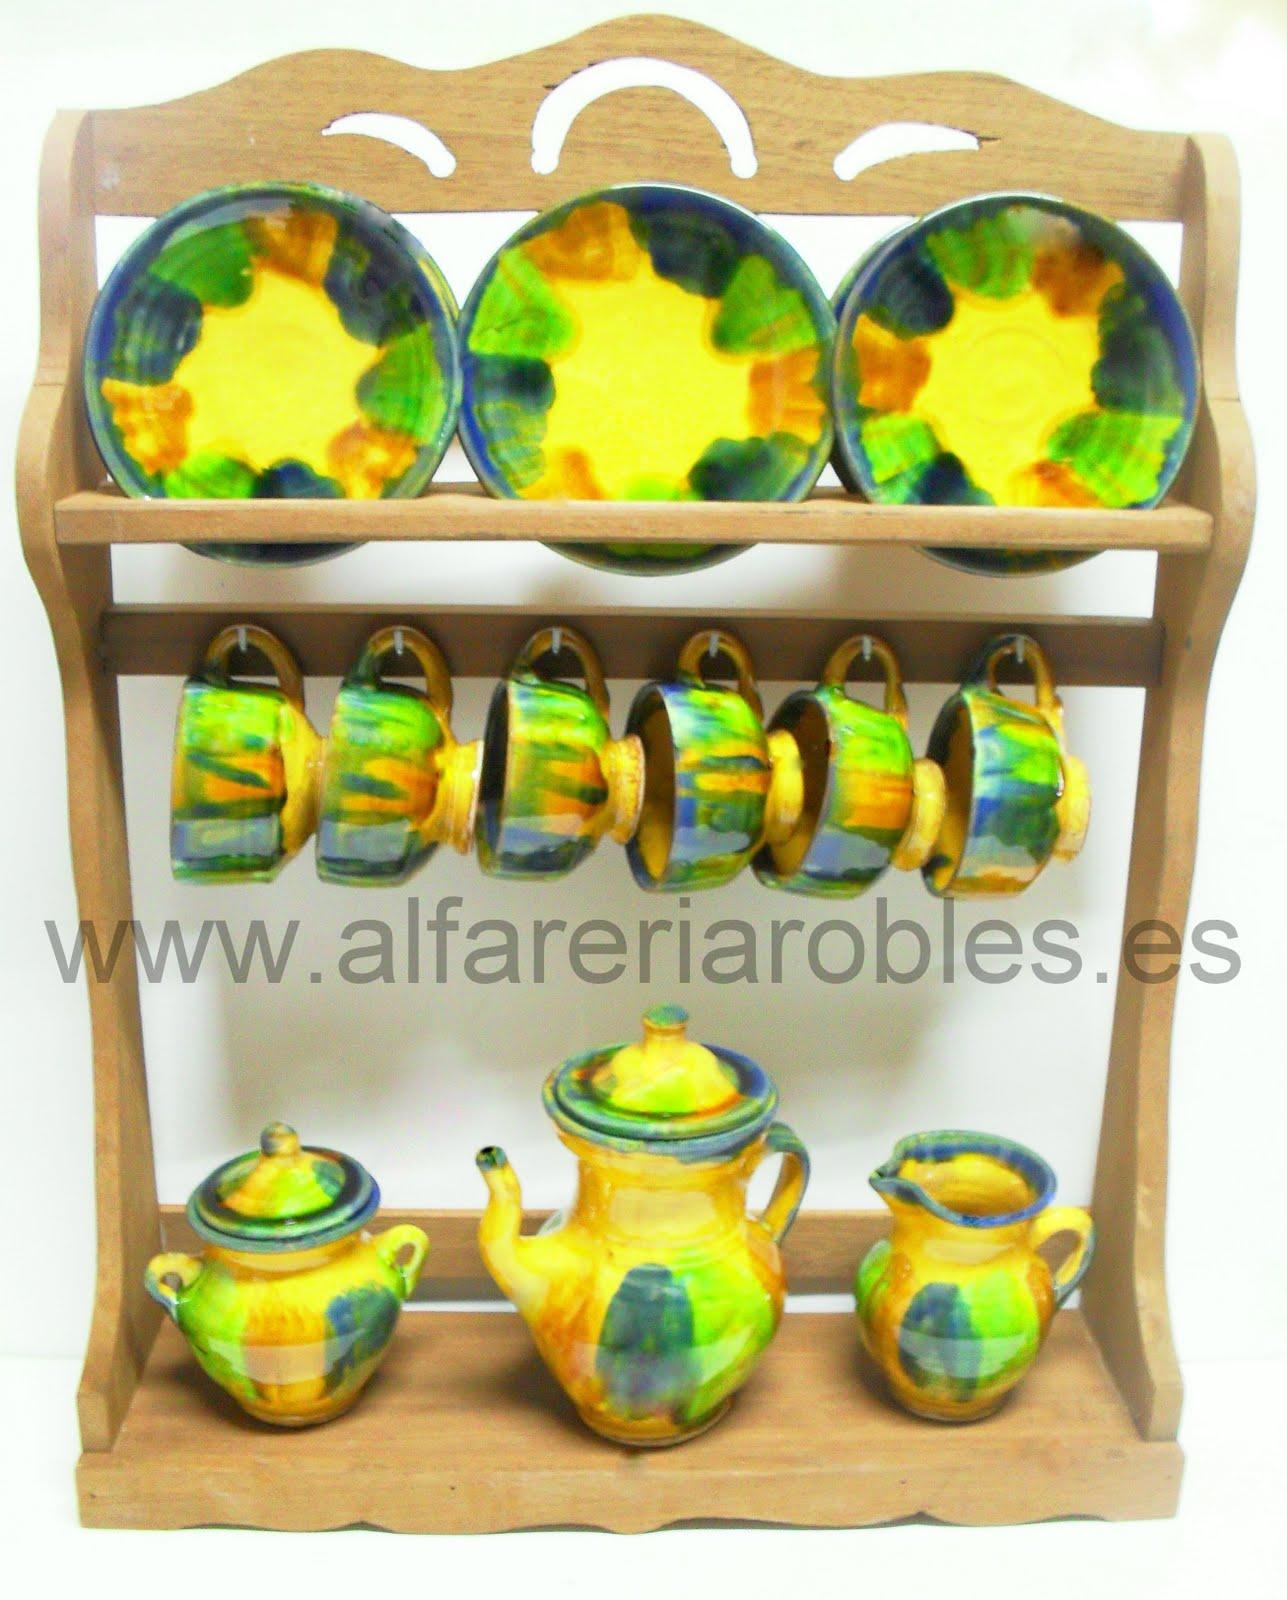 Alfarer a cer mica robles artesan a de almeria juegos - Juego para hacer ceramica ...